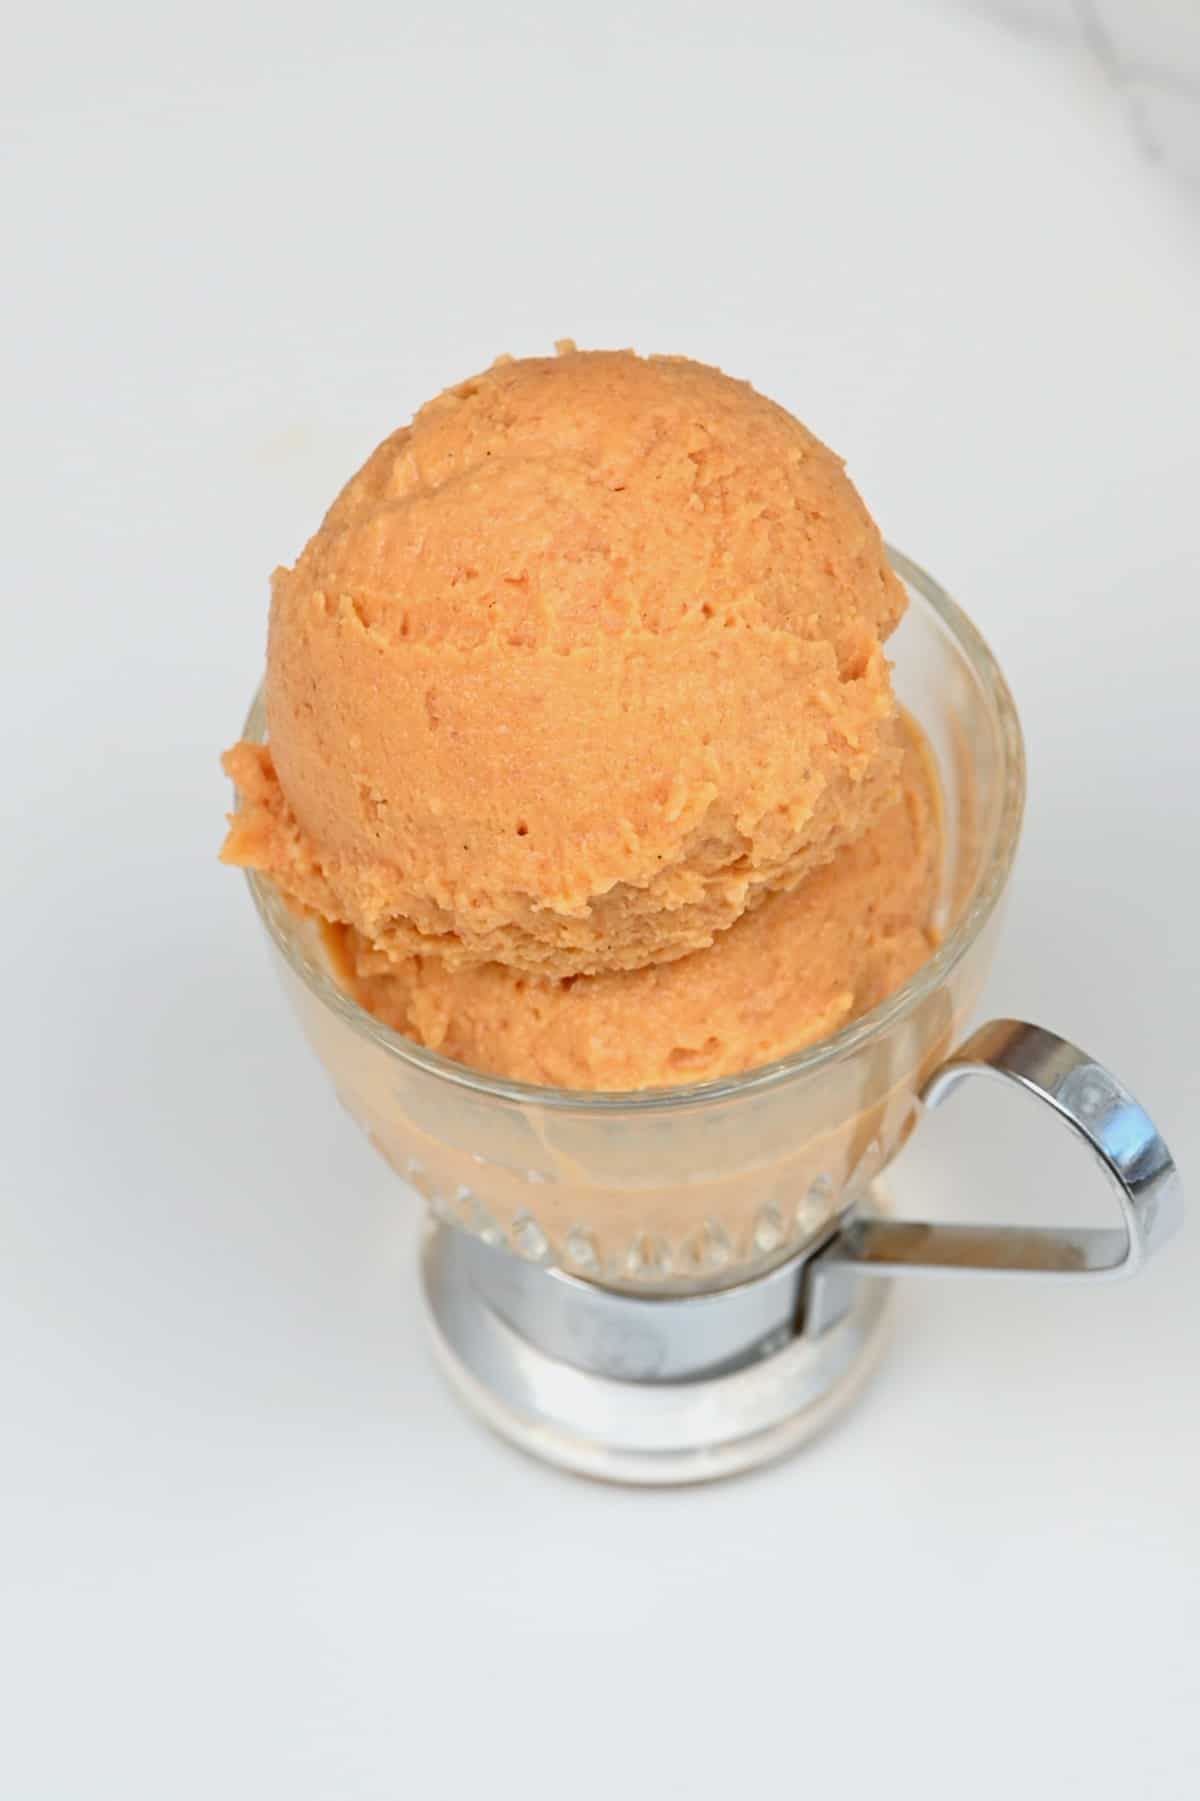 A serving of peach ice cream